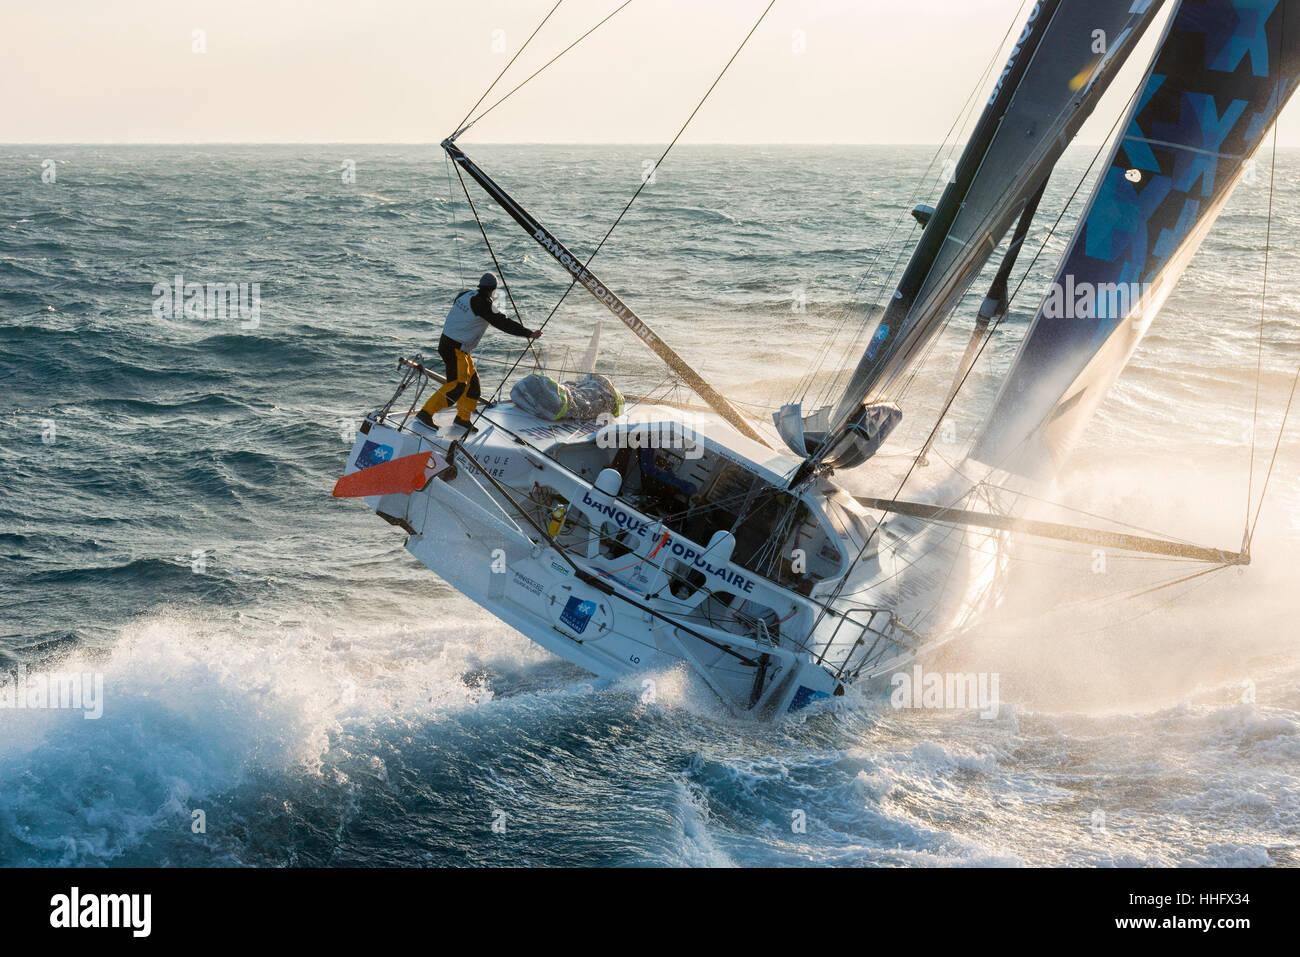 Regatta Vendée Globe 2017: Armel Le Cléac'h an Bord der Banque Populaire VIII Monohull Segeln (2017/01/19) Stockfoto